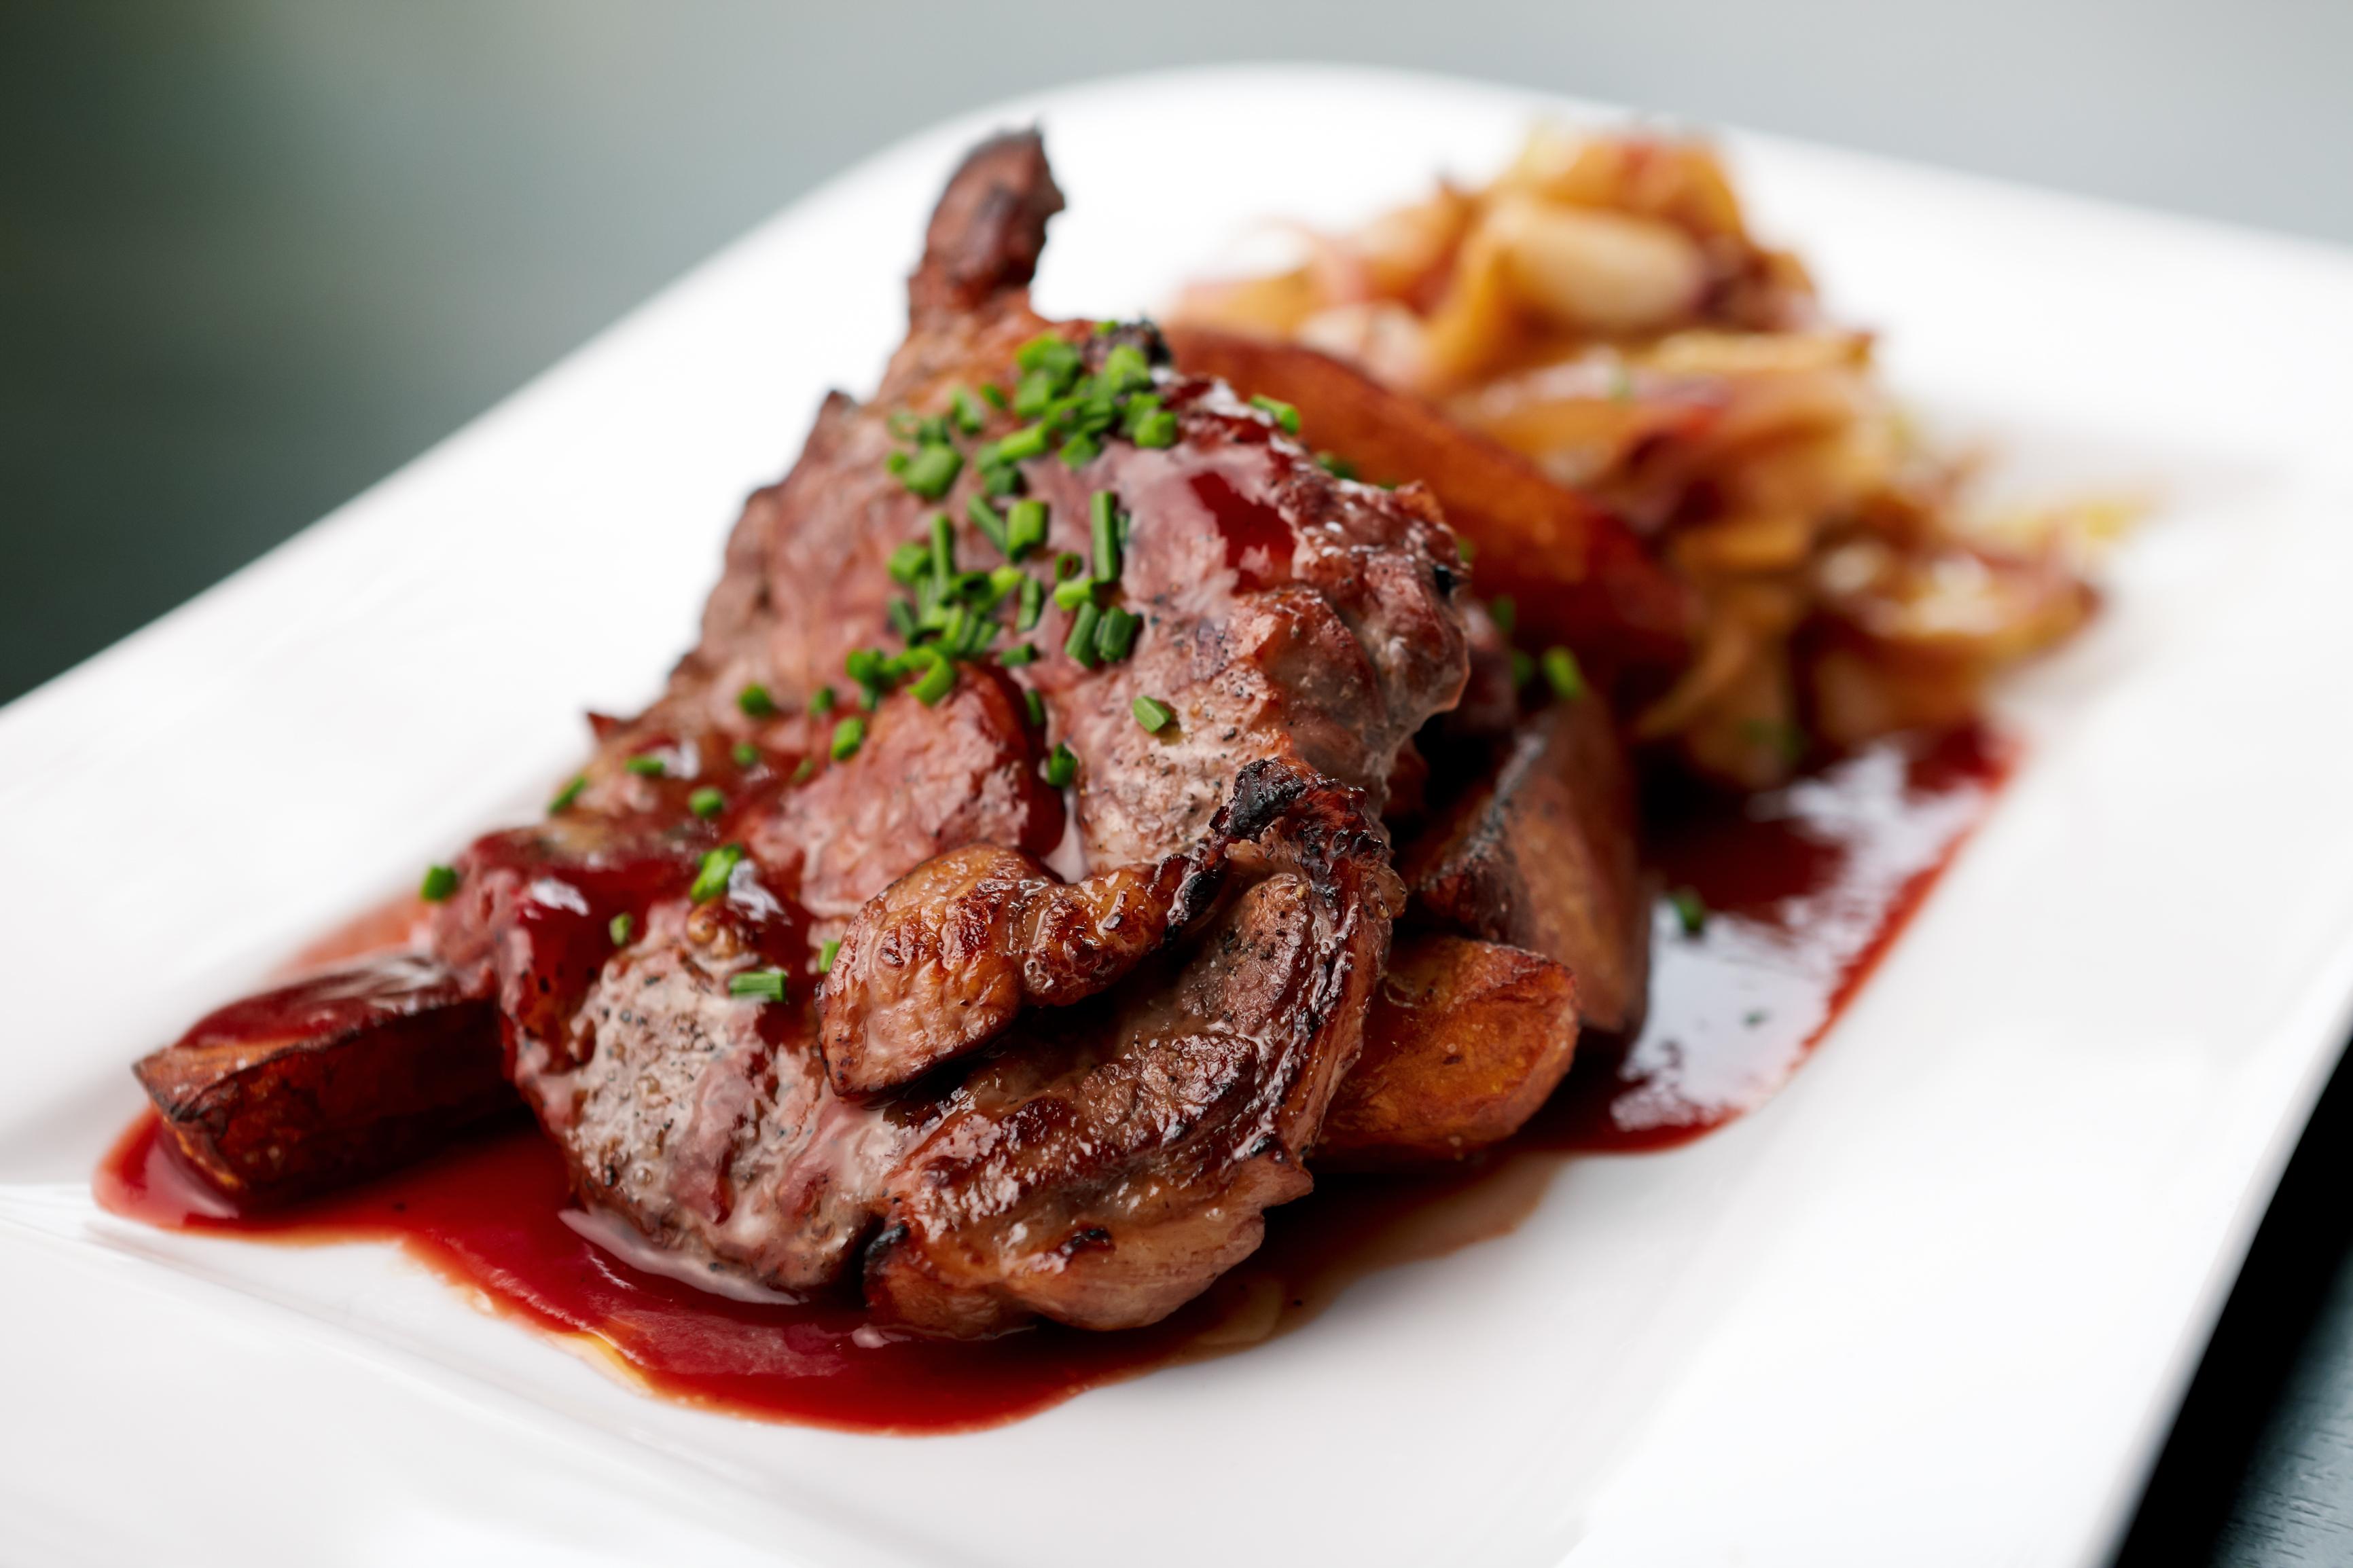 The best types of steak sauce